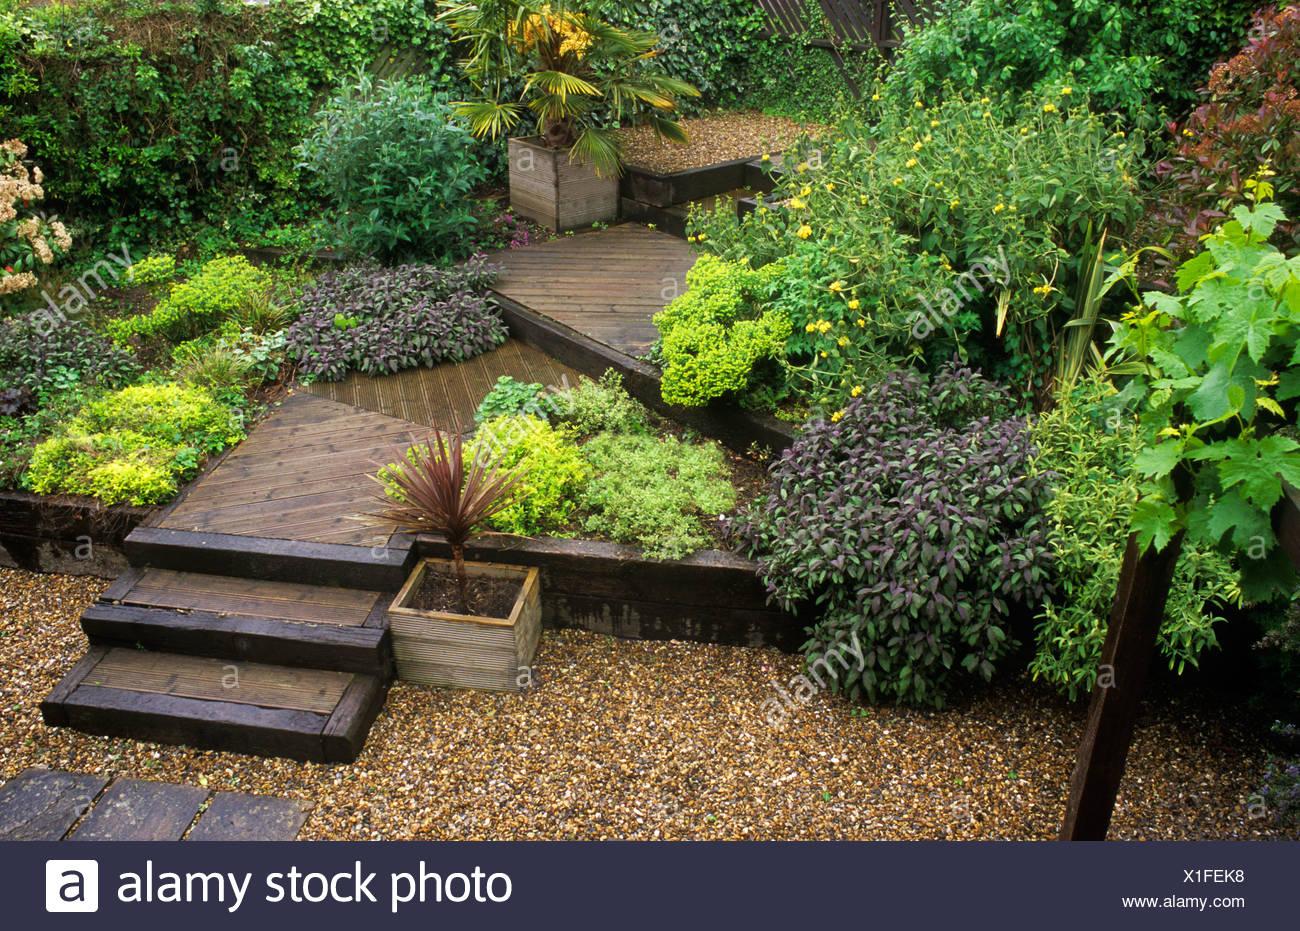 Giardino terrazzato decking passi ghiaia di livelli di - Ghiaia x giardino ...